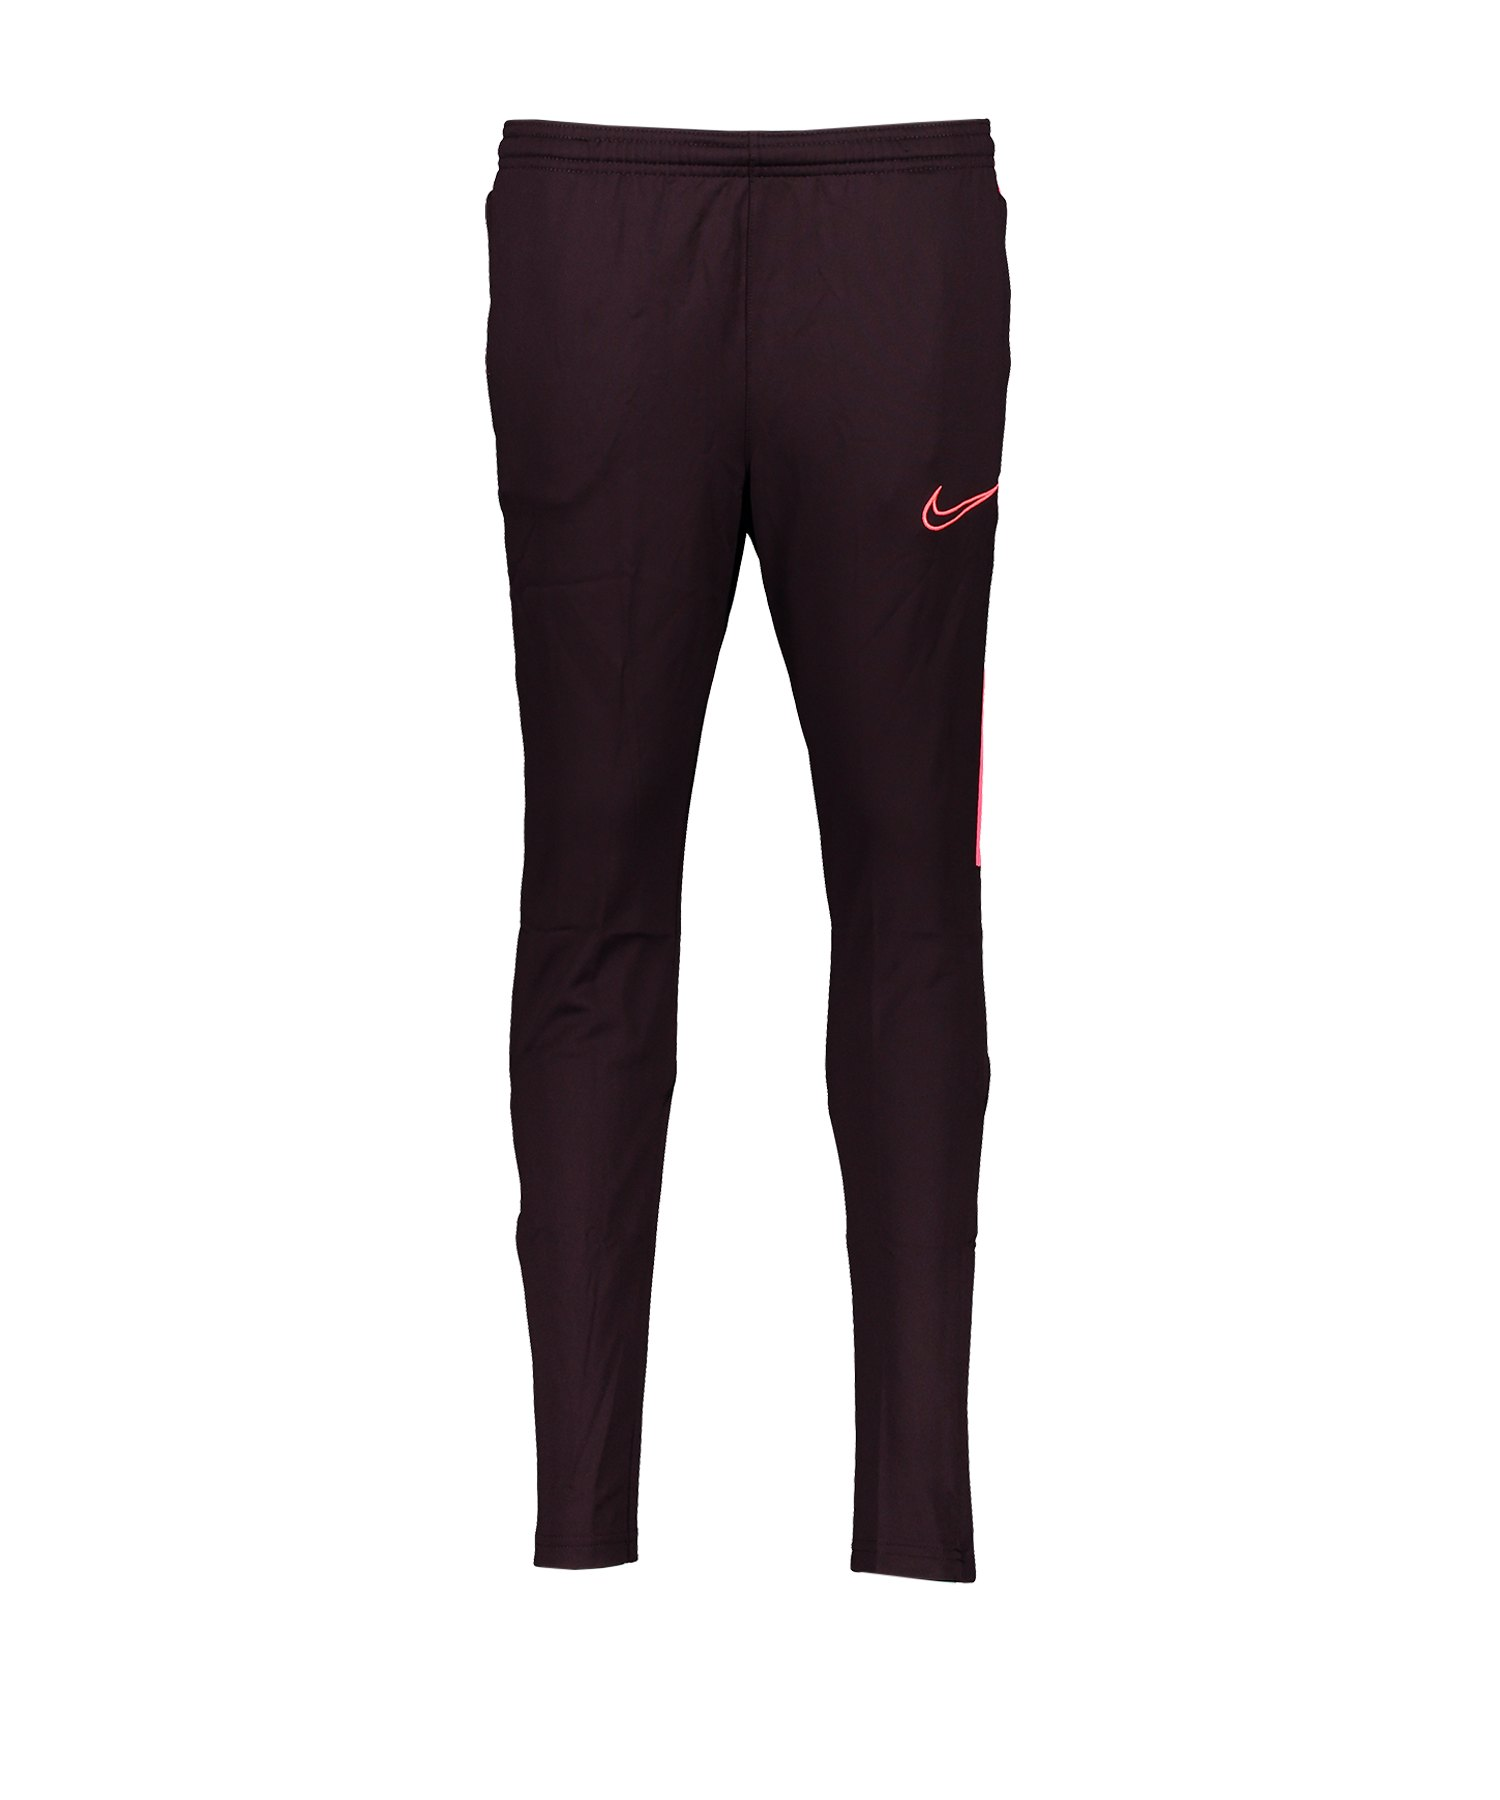 Nike Dry Academy Pant Jogginghose Kids Rot F659 - rot